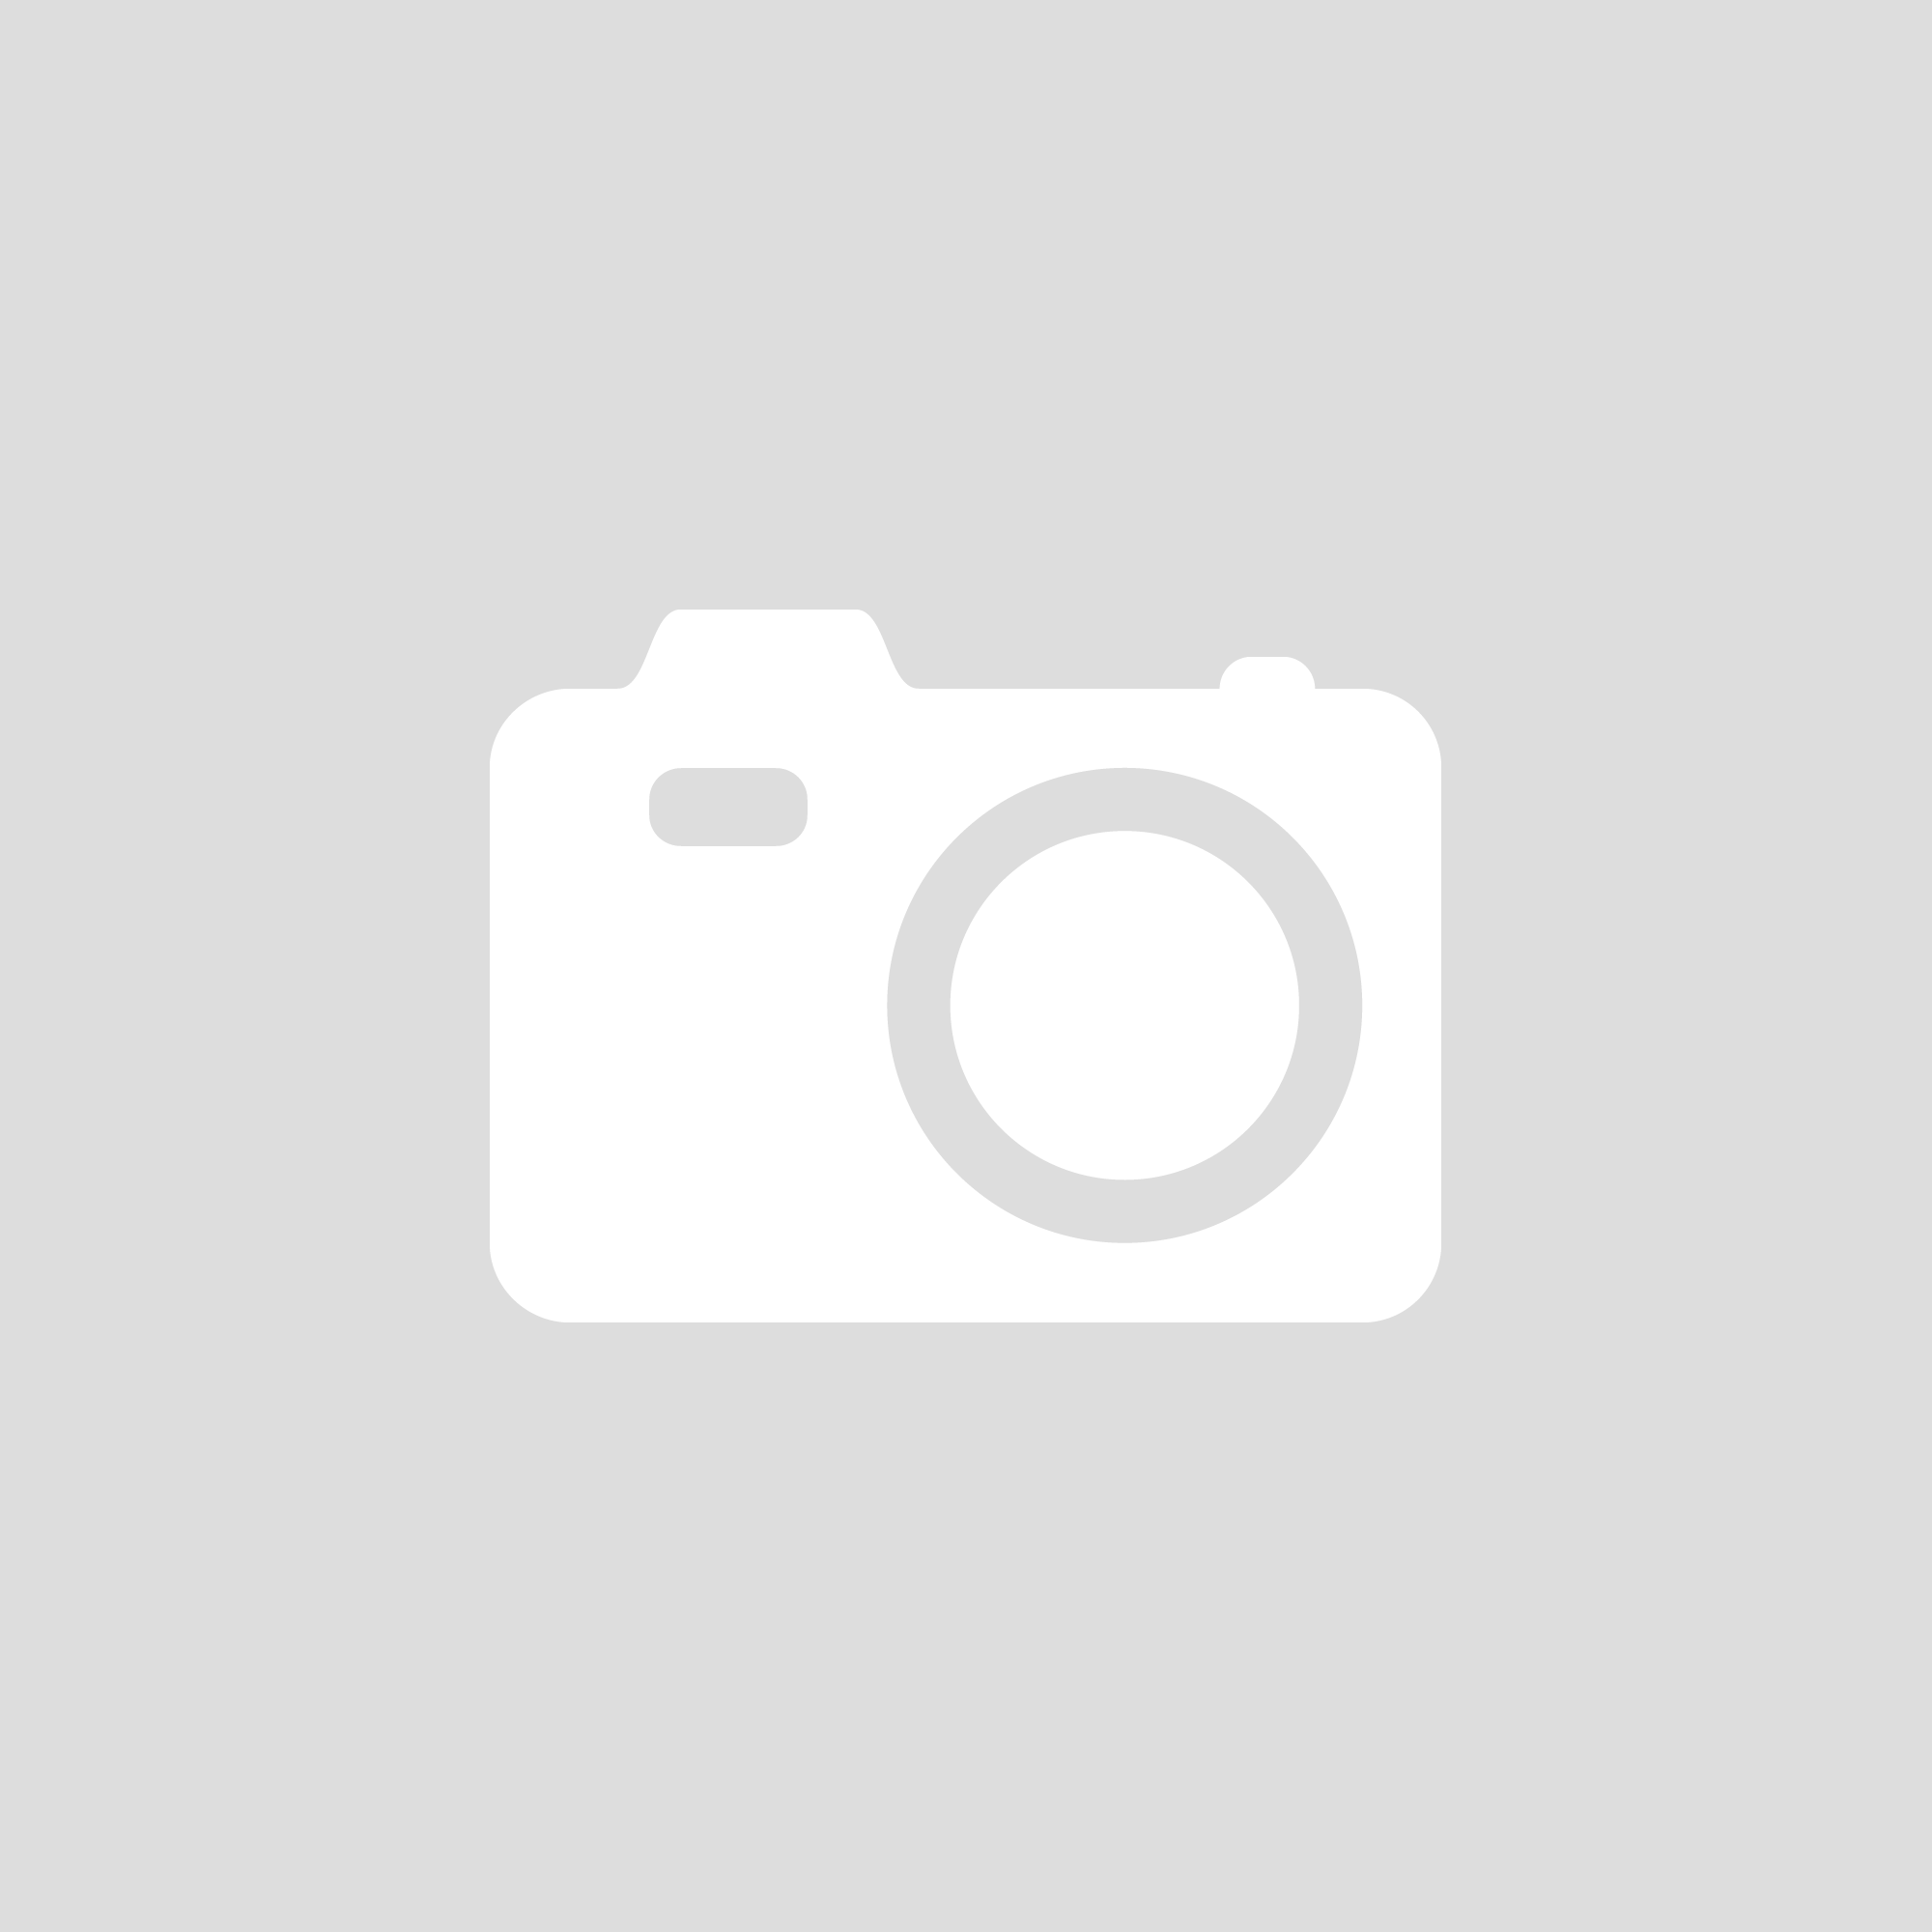 Sensation Plain Purple Wallpaper by GranDeco 227219